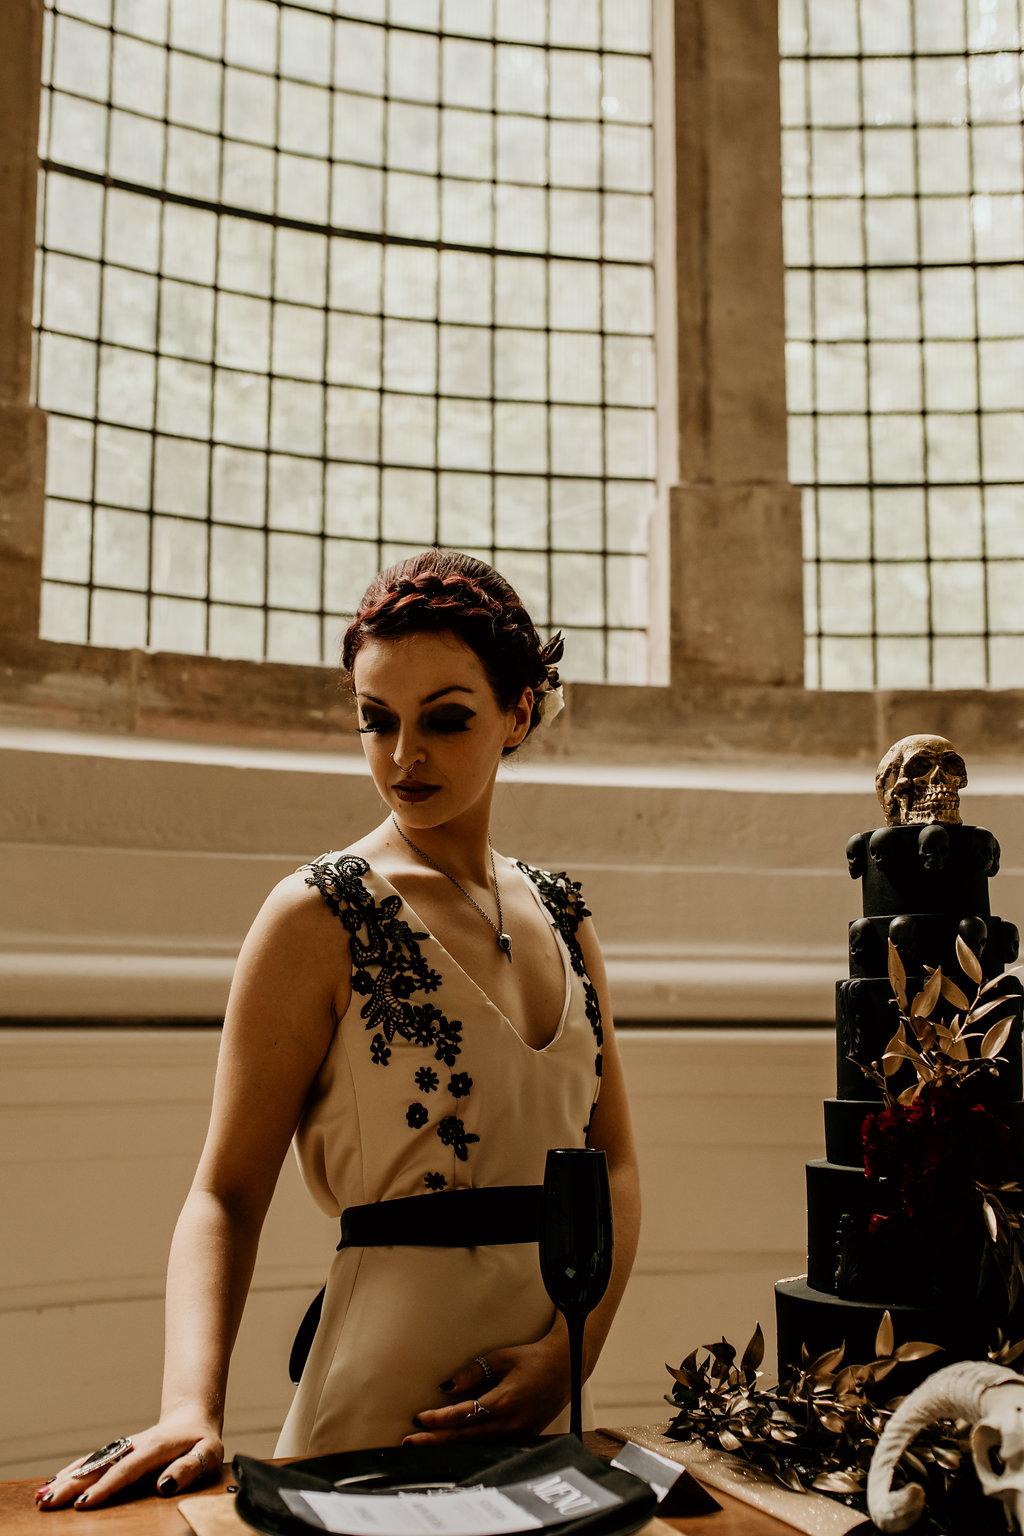 Chloe Mary Photography - Babes with the Power wedding- Rebel Rebel - Alternative wedding - Gothic wedding 17